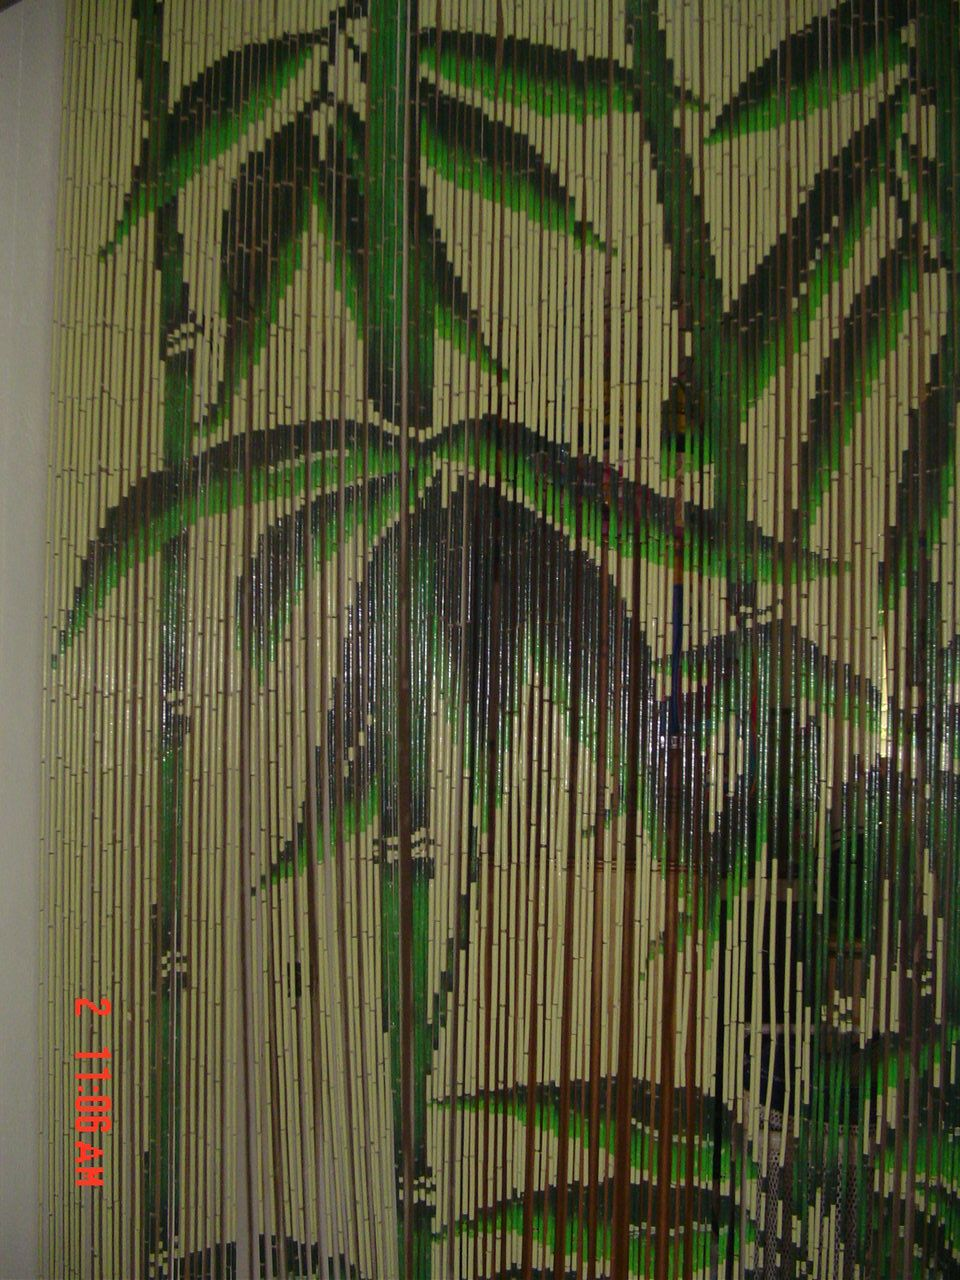 Bamboo Print Curtains Blinds Shades Curtains Curtains